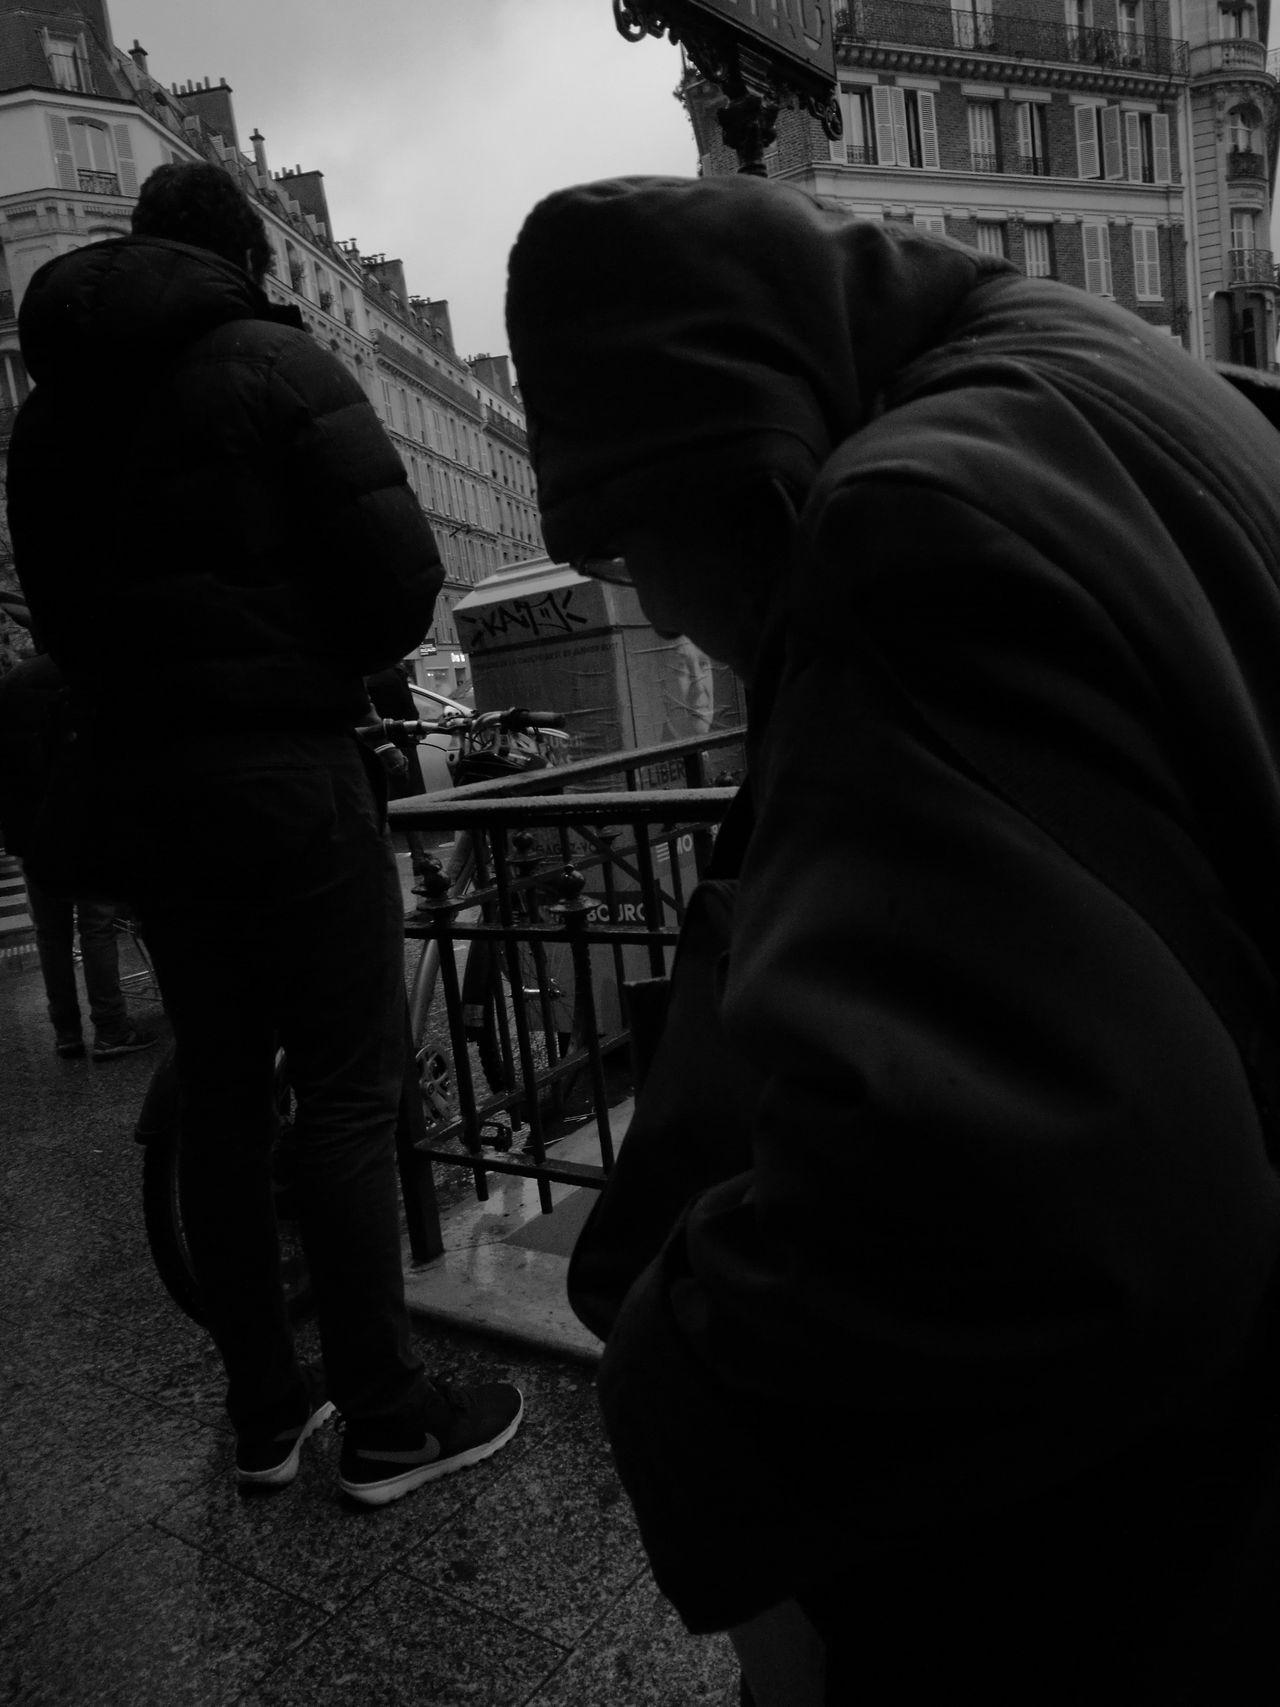 City City Street Real People Adult Outdoors Wet City Life Rain EyeEmNewHere Black&white Black And White Blackandwhite Black And White Photography Streetphotography France Street Paris